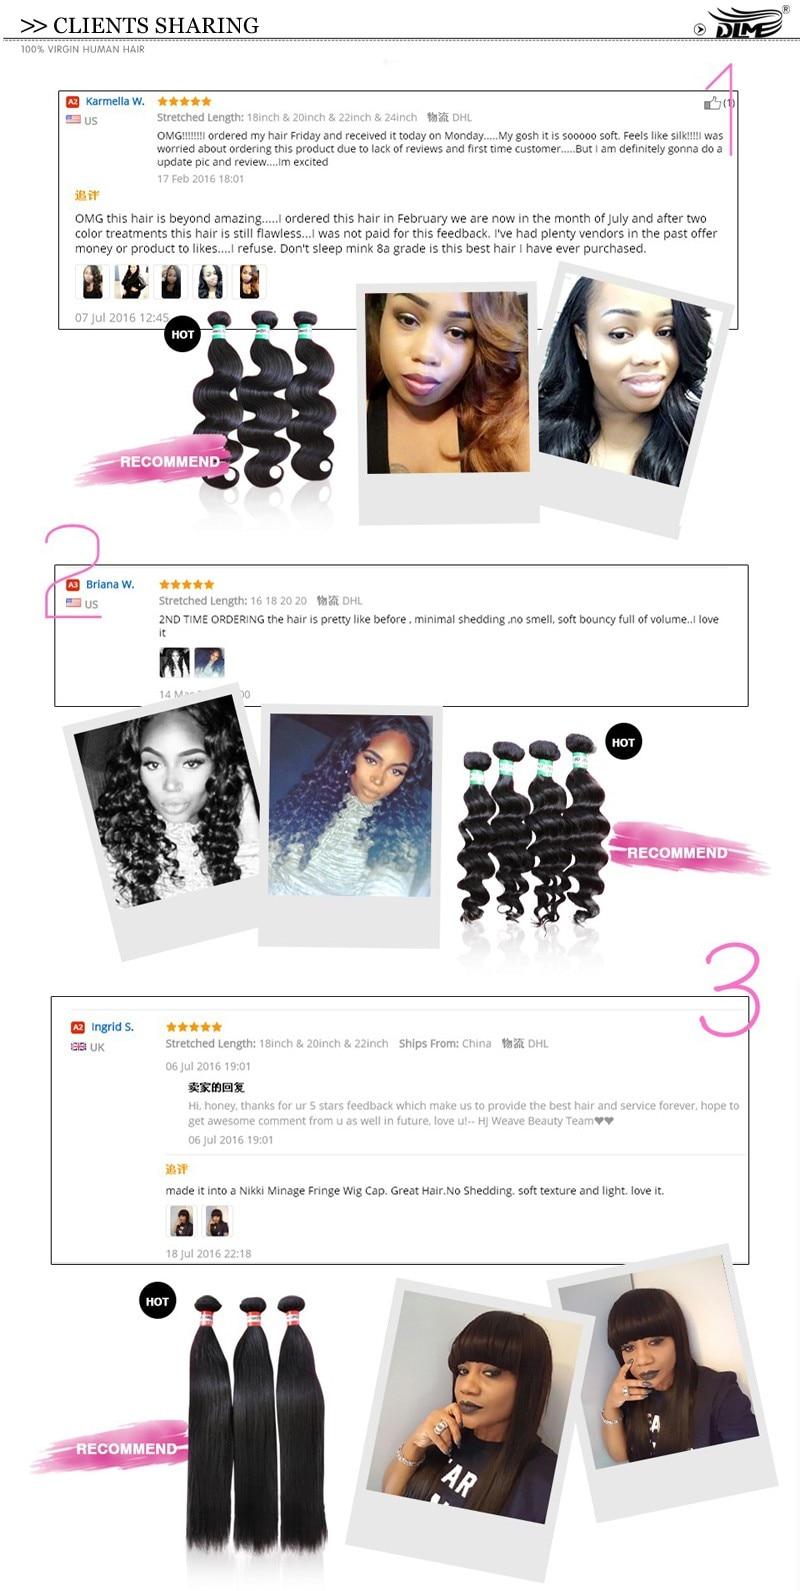 10A Afro Kinky Bulk Hair 3 Bundles Natural Deep Curly Hair Bulk Virgin Brazilian Bulk Hair Extensions Best Curly Hair Braiding